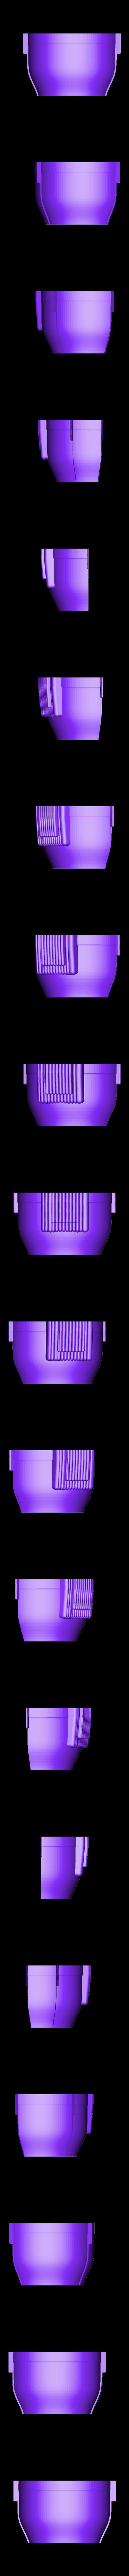 Breen_v3_part_4.stl Download free STL file Breen Helmet • 3D printer template, poblocki1982